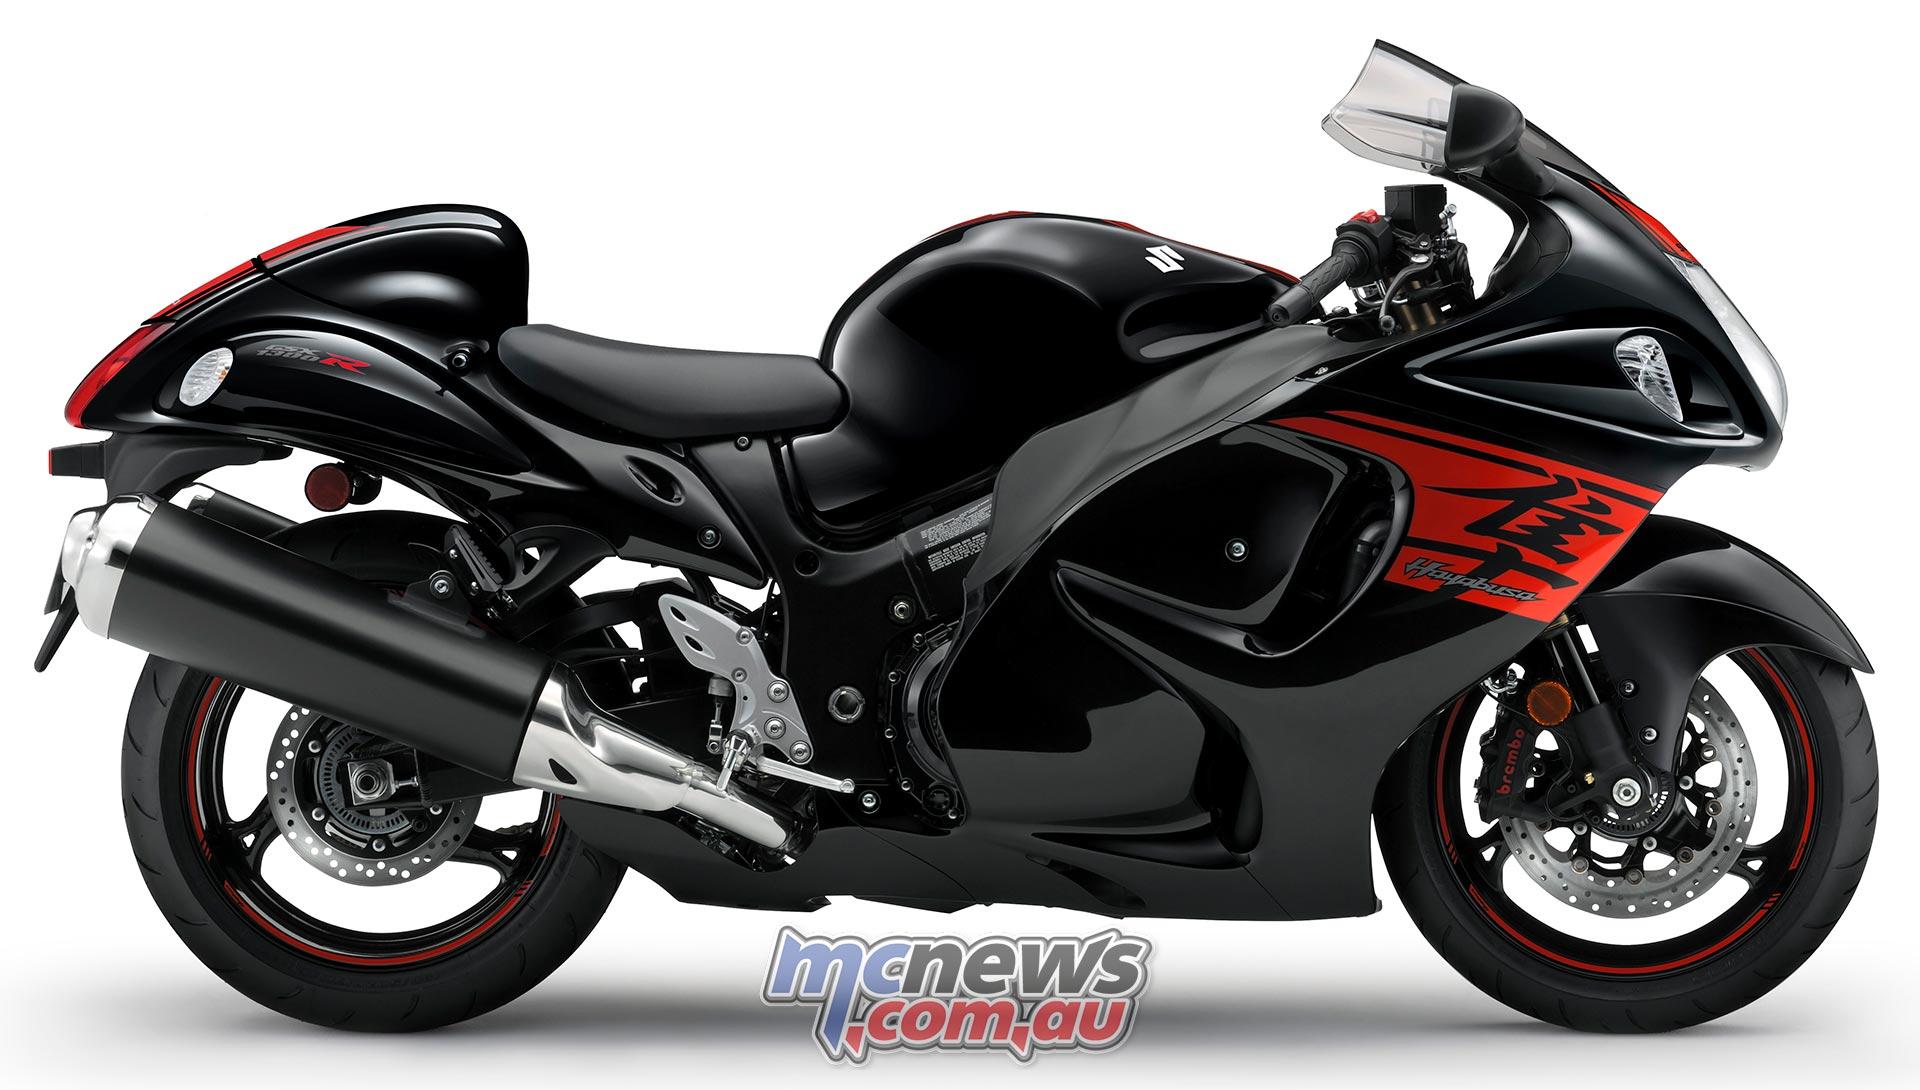 2018 Suzuki GSX1300R | GSX-R750 | GSX-R600 | MCNews.com.au